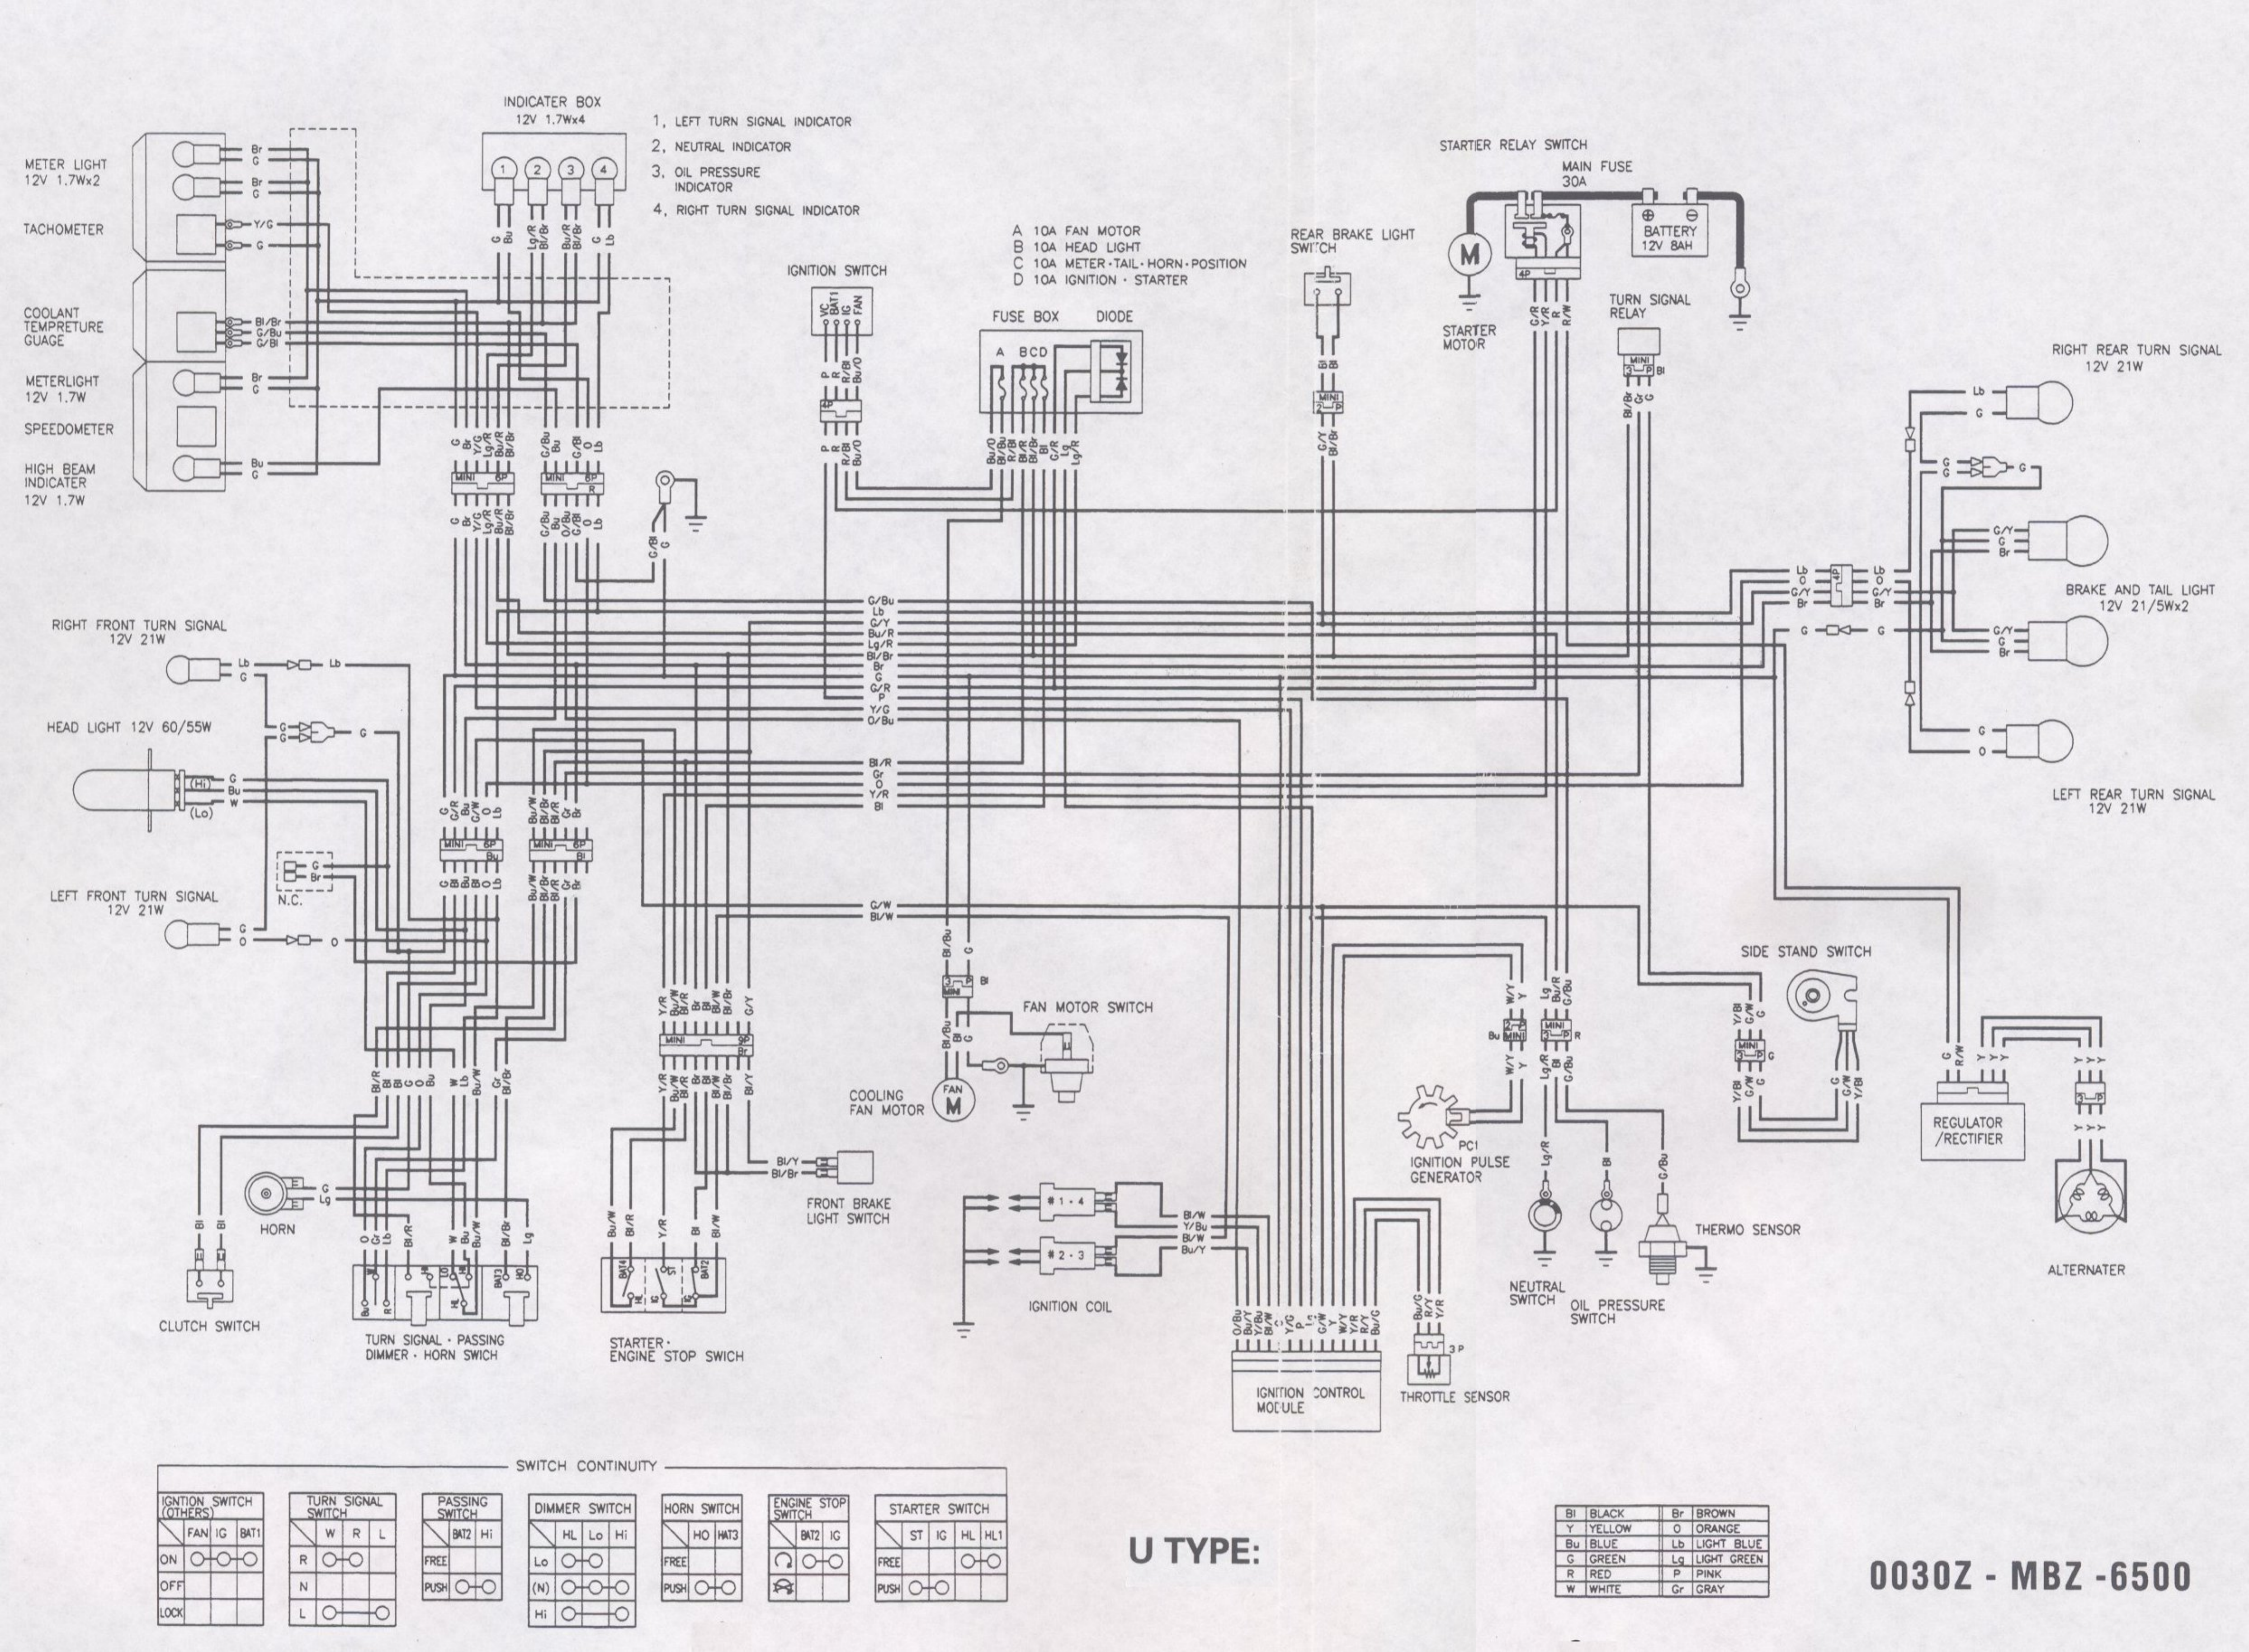 DIAGRAM] Honda Hornet 600 Wiring Diagram FULL Version HD Quality Wiring  Diagram - MALLDIAGRAMSG.DINAMIKASOFTWARE.IT